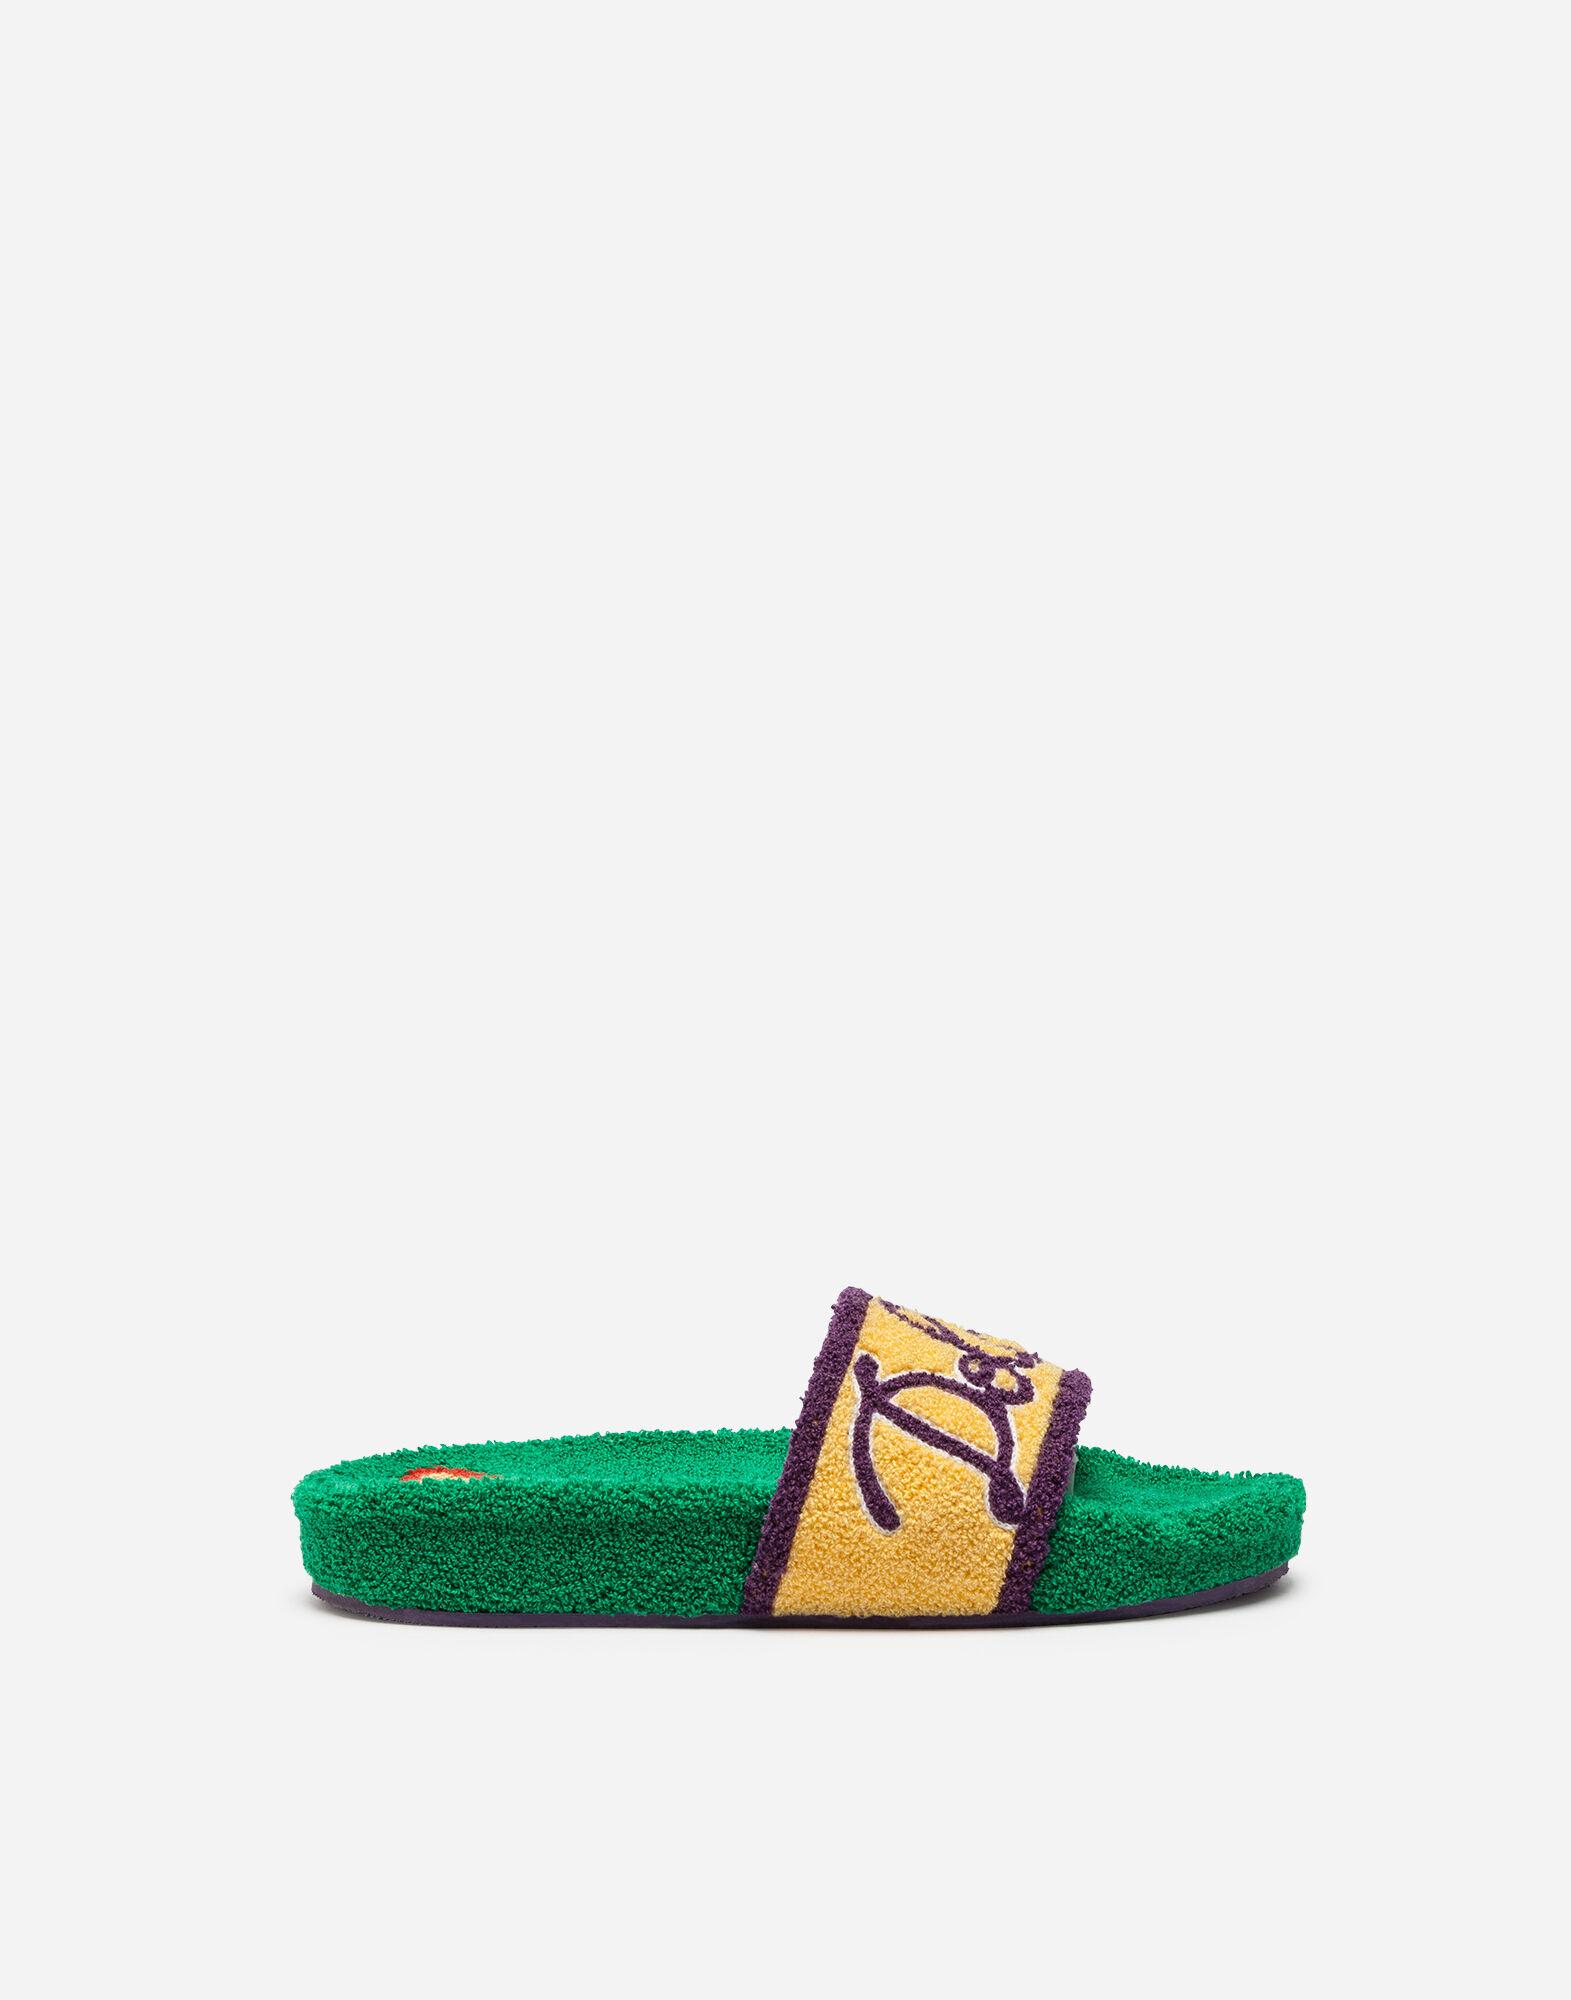 Dolce&Gabbana TERRY SANDAL